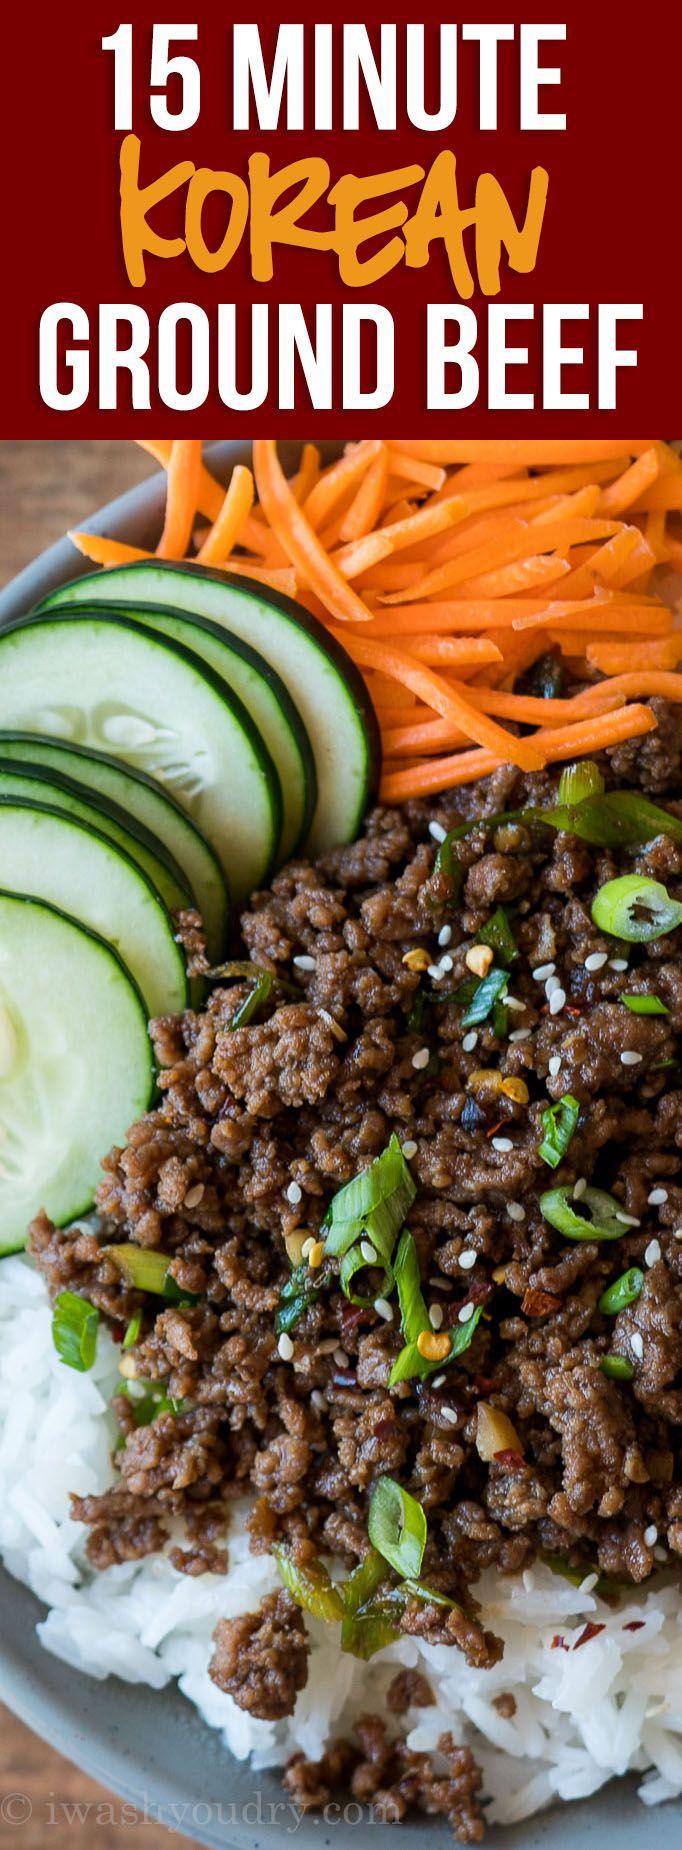 Easy Korean Ground Beef Recipe Recipe Korean Ground Beef Beef Recipes For Dinner Ground Beef Recipes